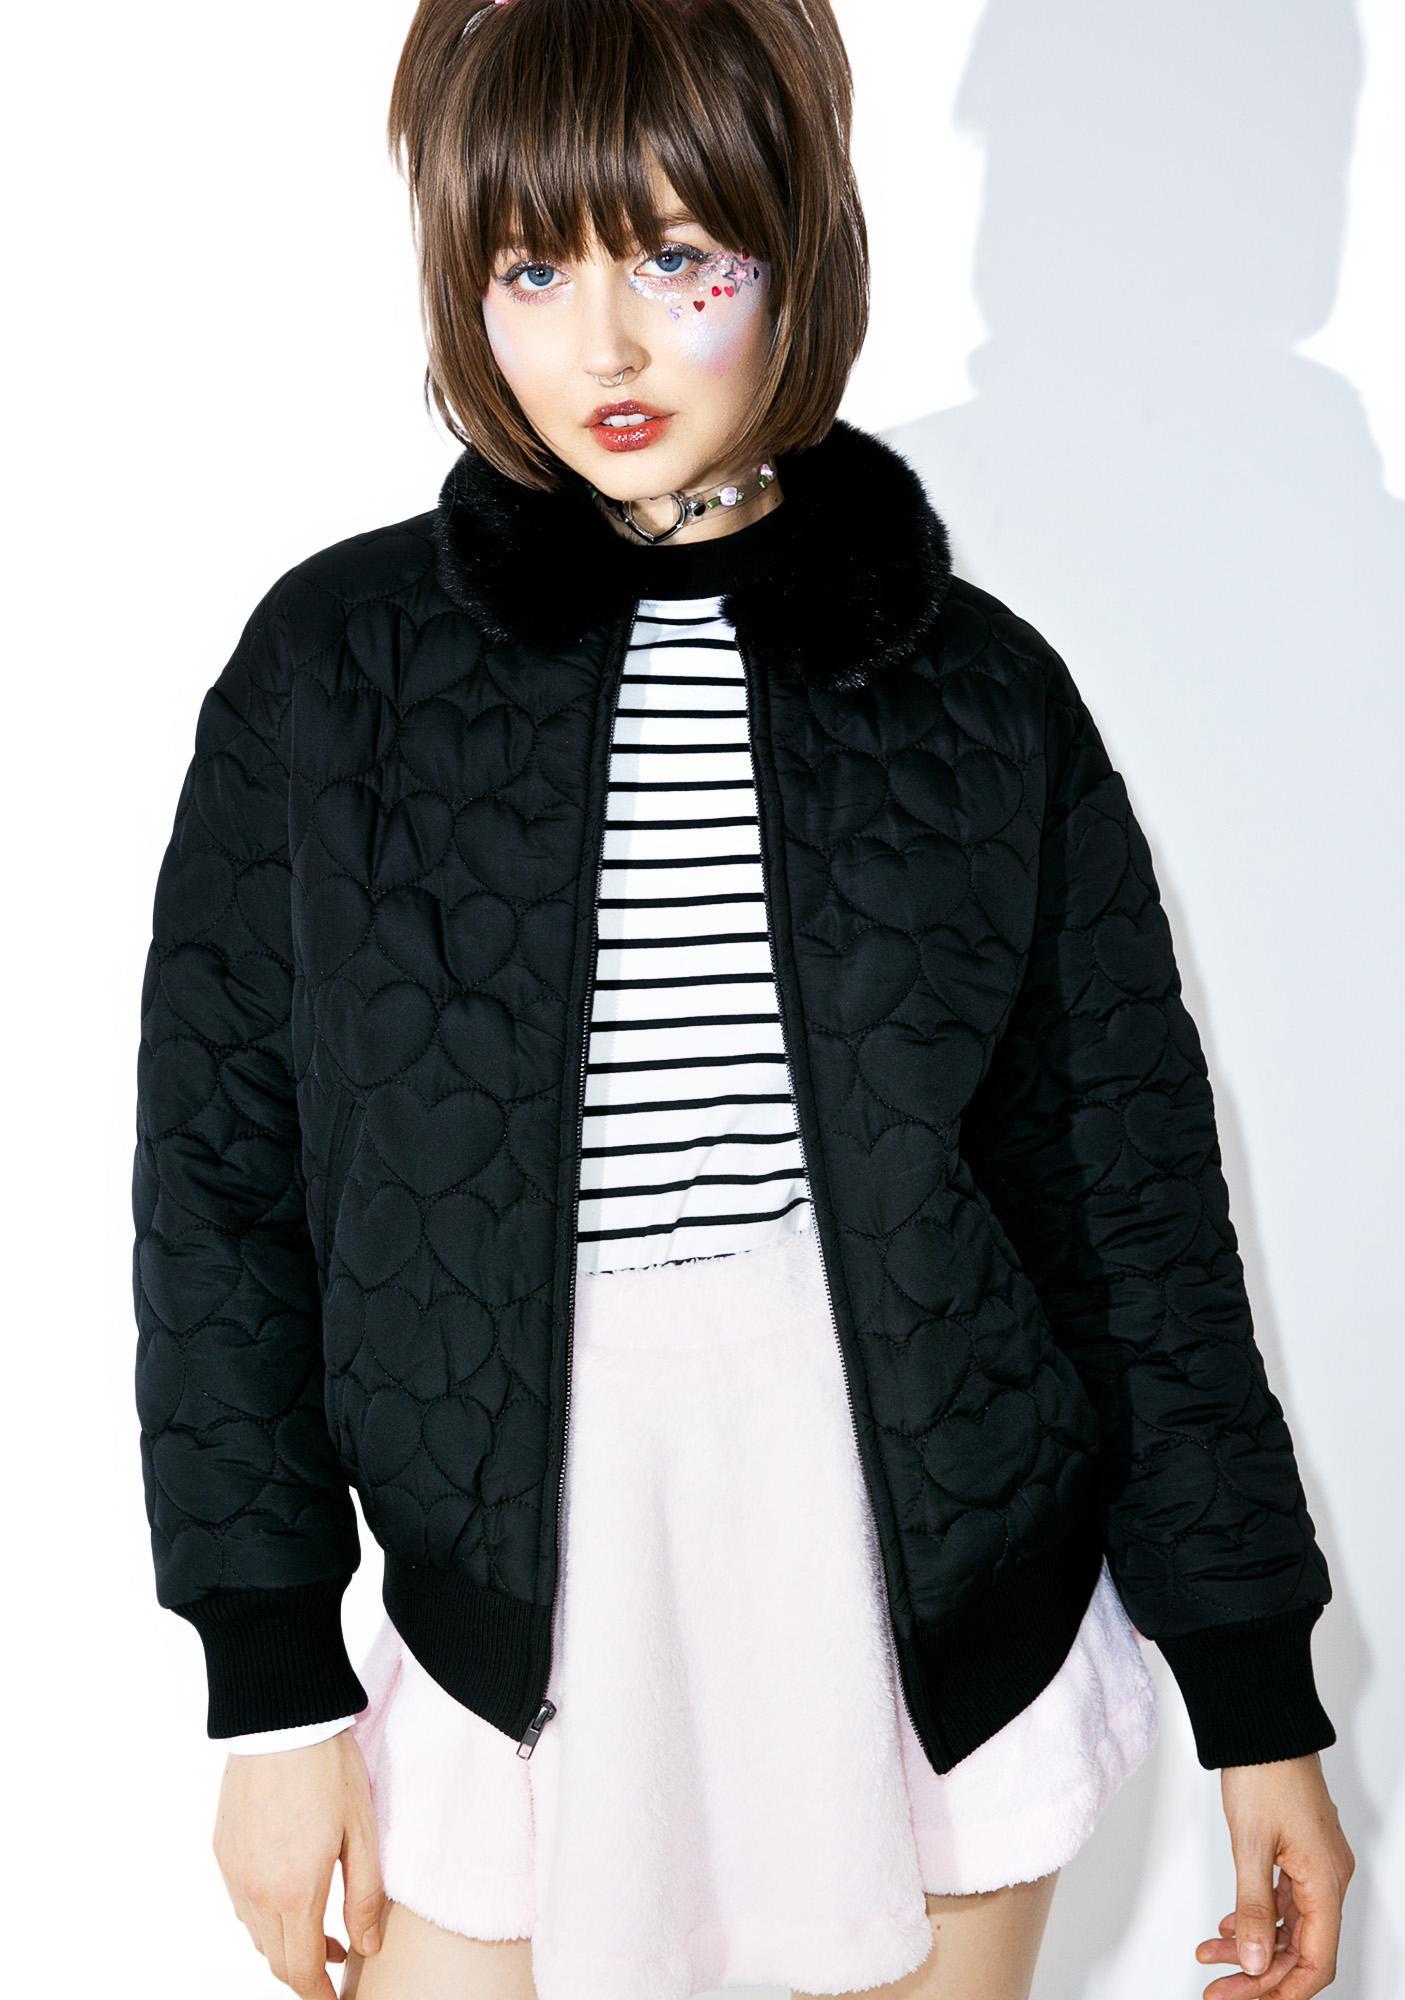 Lazy Oaf Black Heart Bomber Jacket